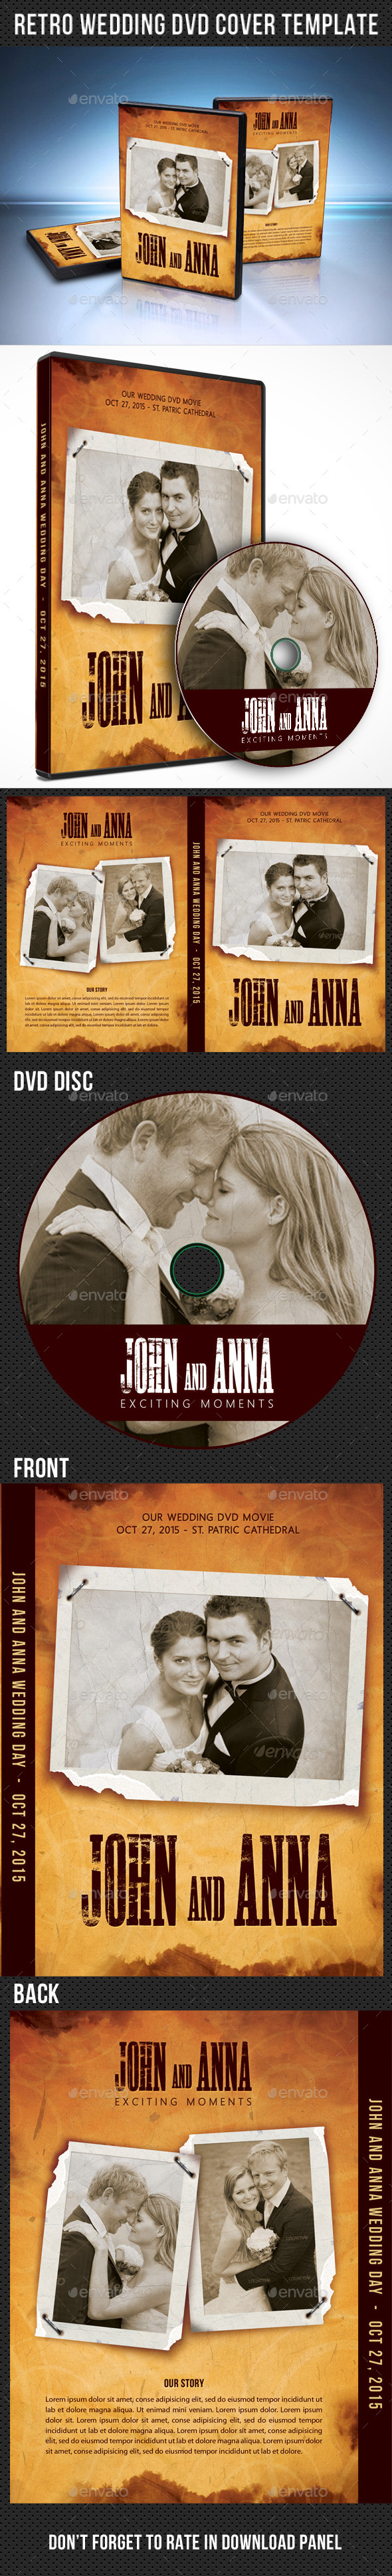 Retro Wedding DVD Cover Template 04 - CD & DVD Artwork Print Templates